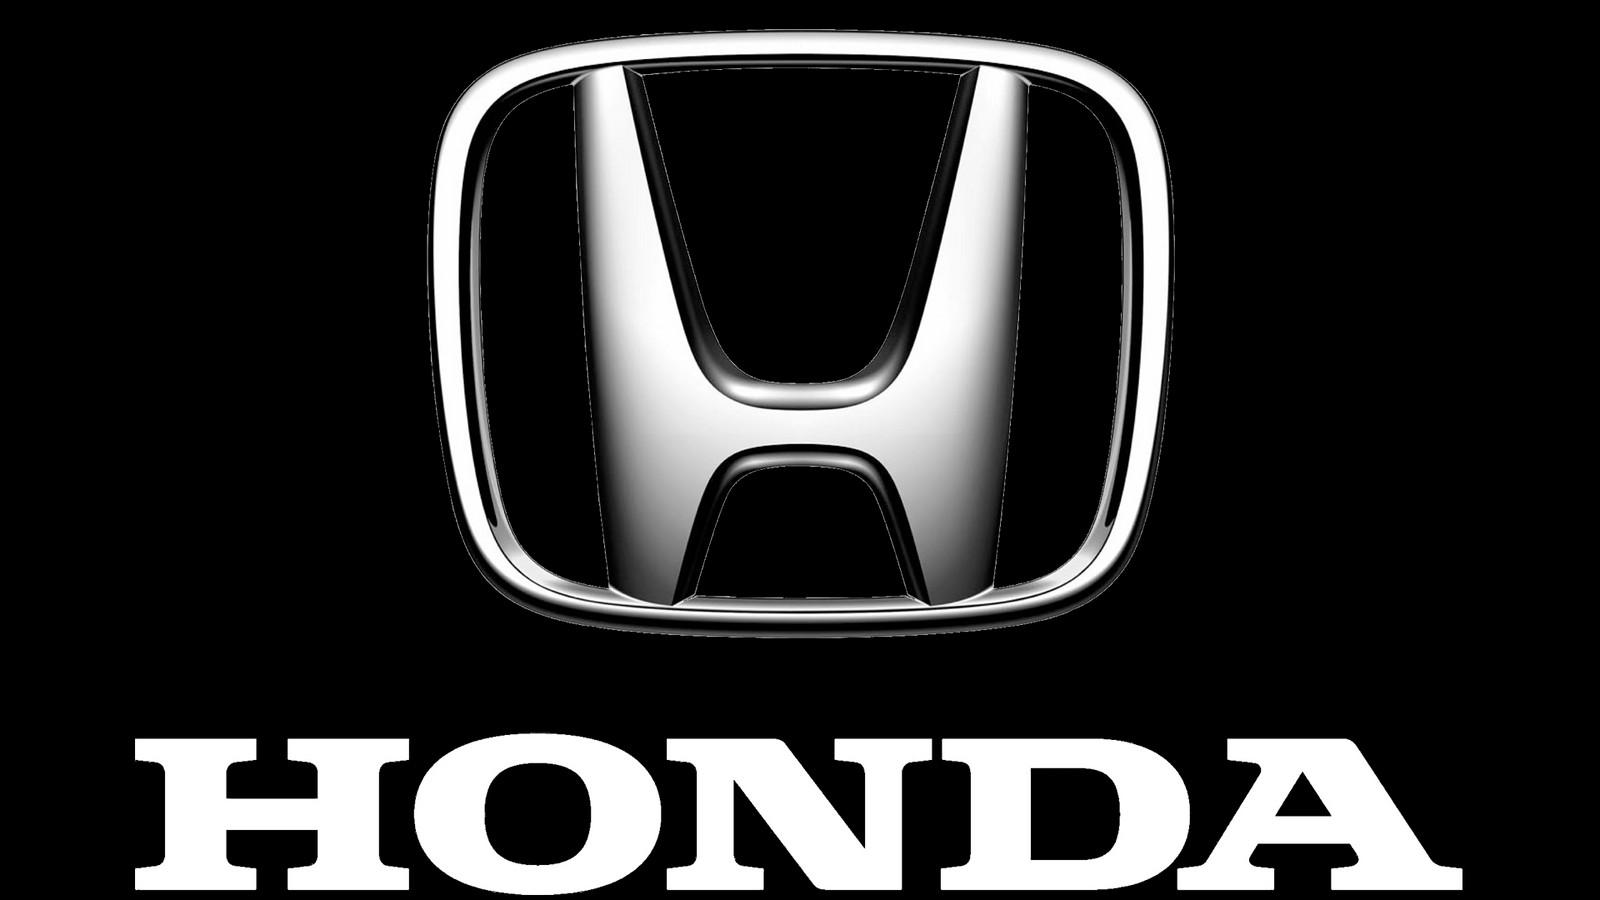 Honda Logo W Stroke Png